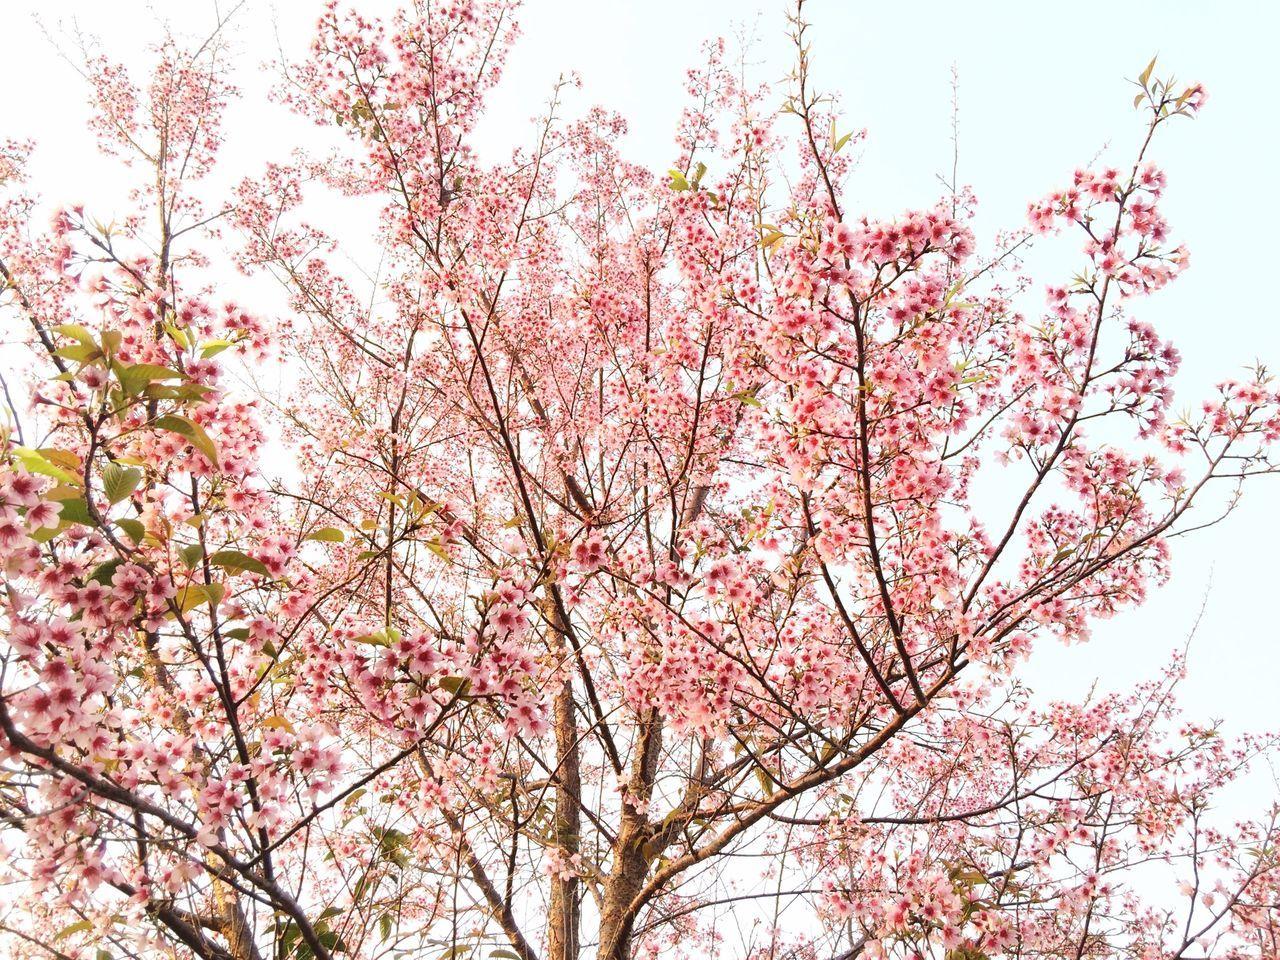 Wild Himalayan Cherry Prunus Cerasoides Prunus Doi Luang, Chiang Dao Sakura Thailand Cerasoides Chiang Dao Chiang Mai | Thailand Flower